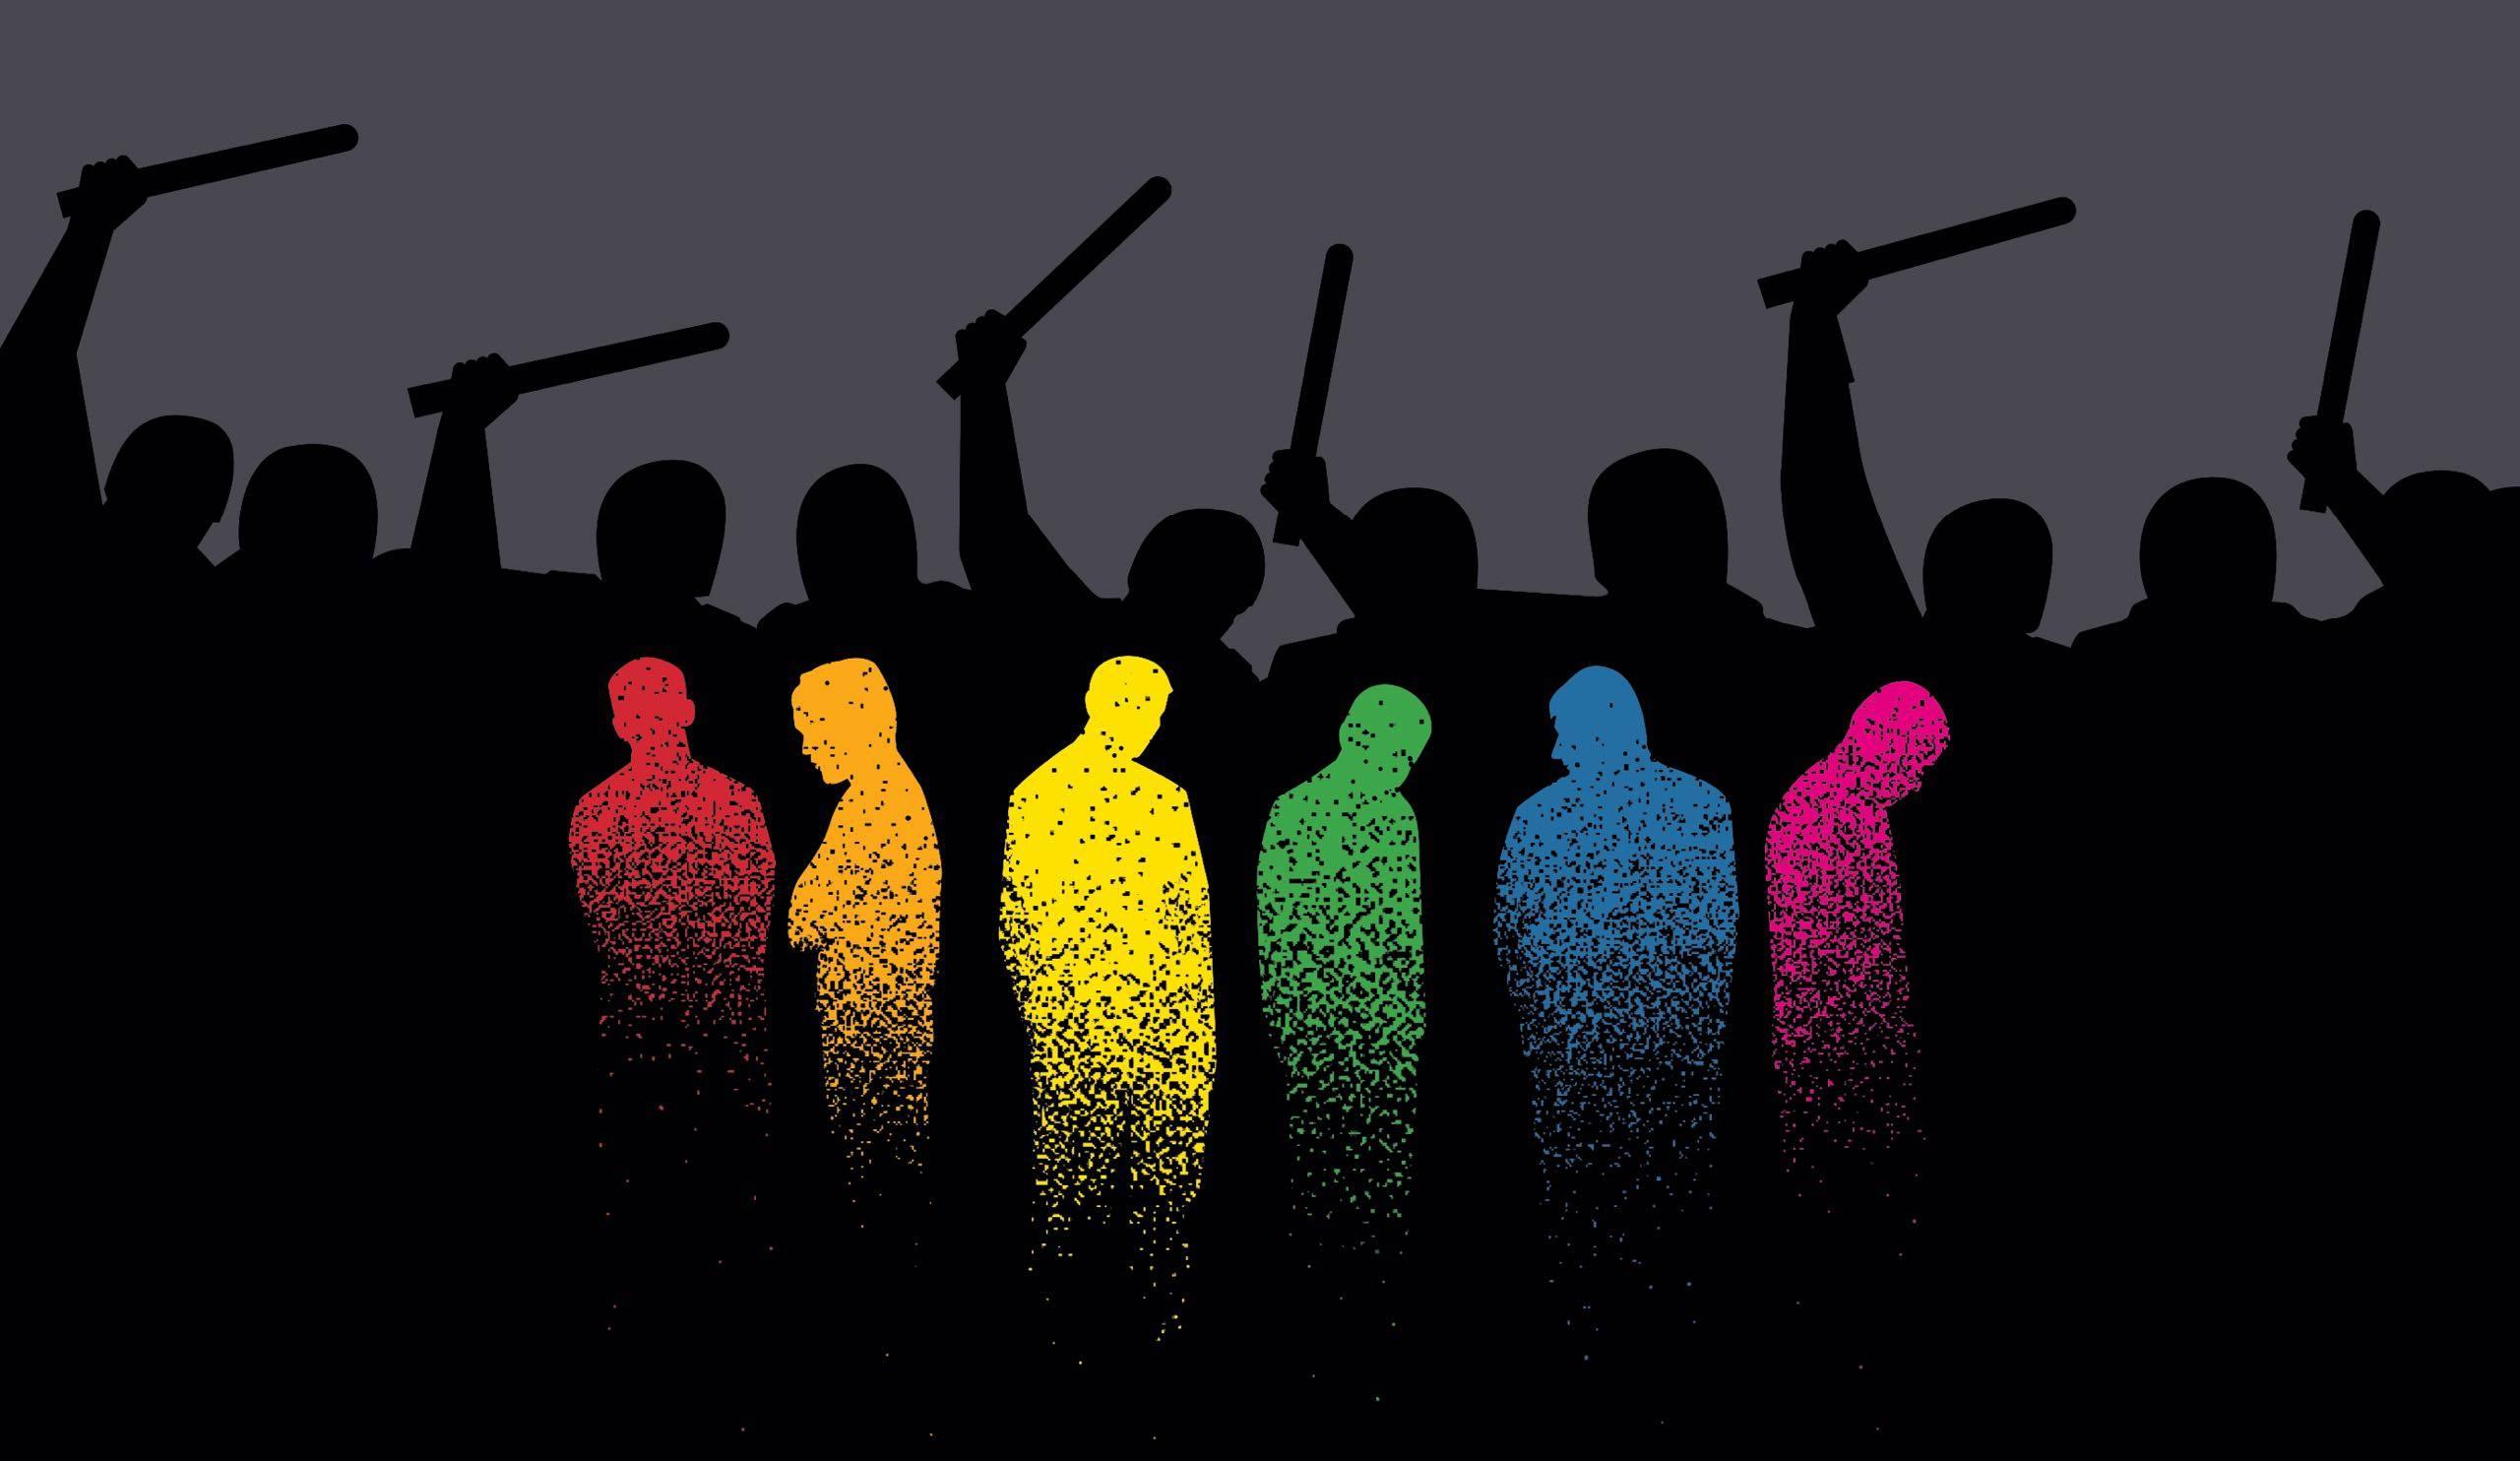 Homophobic Nation